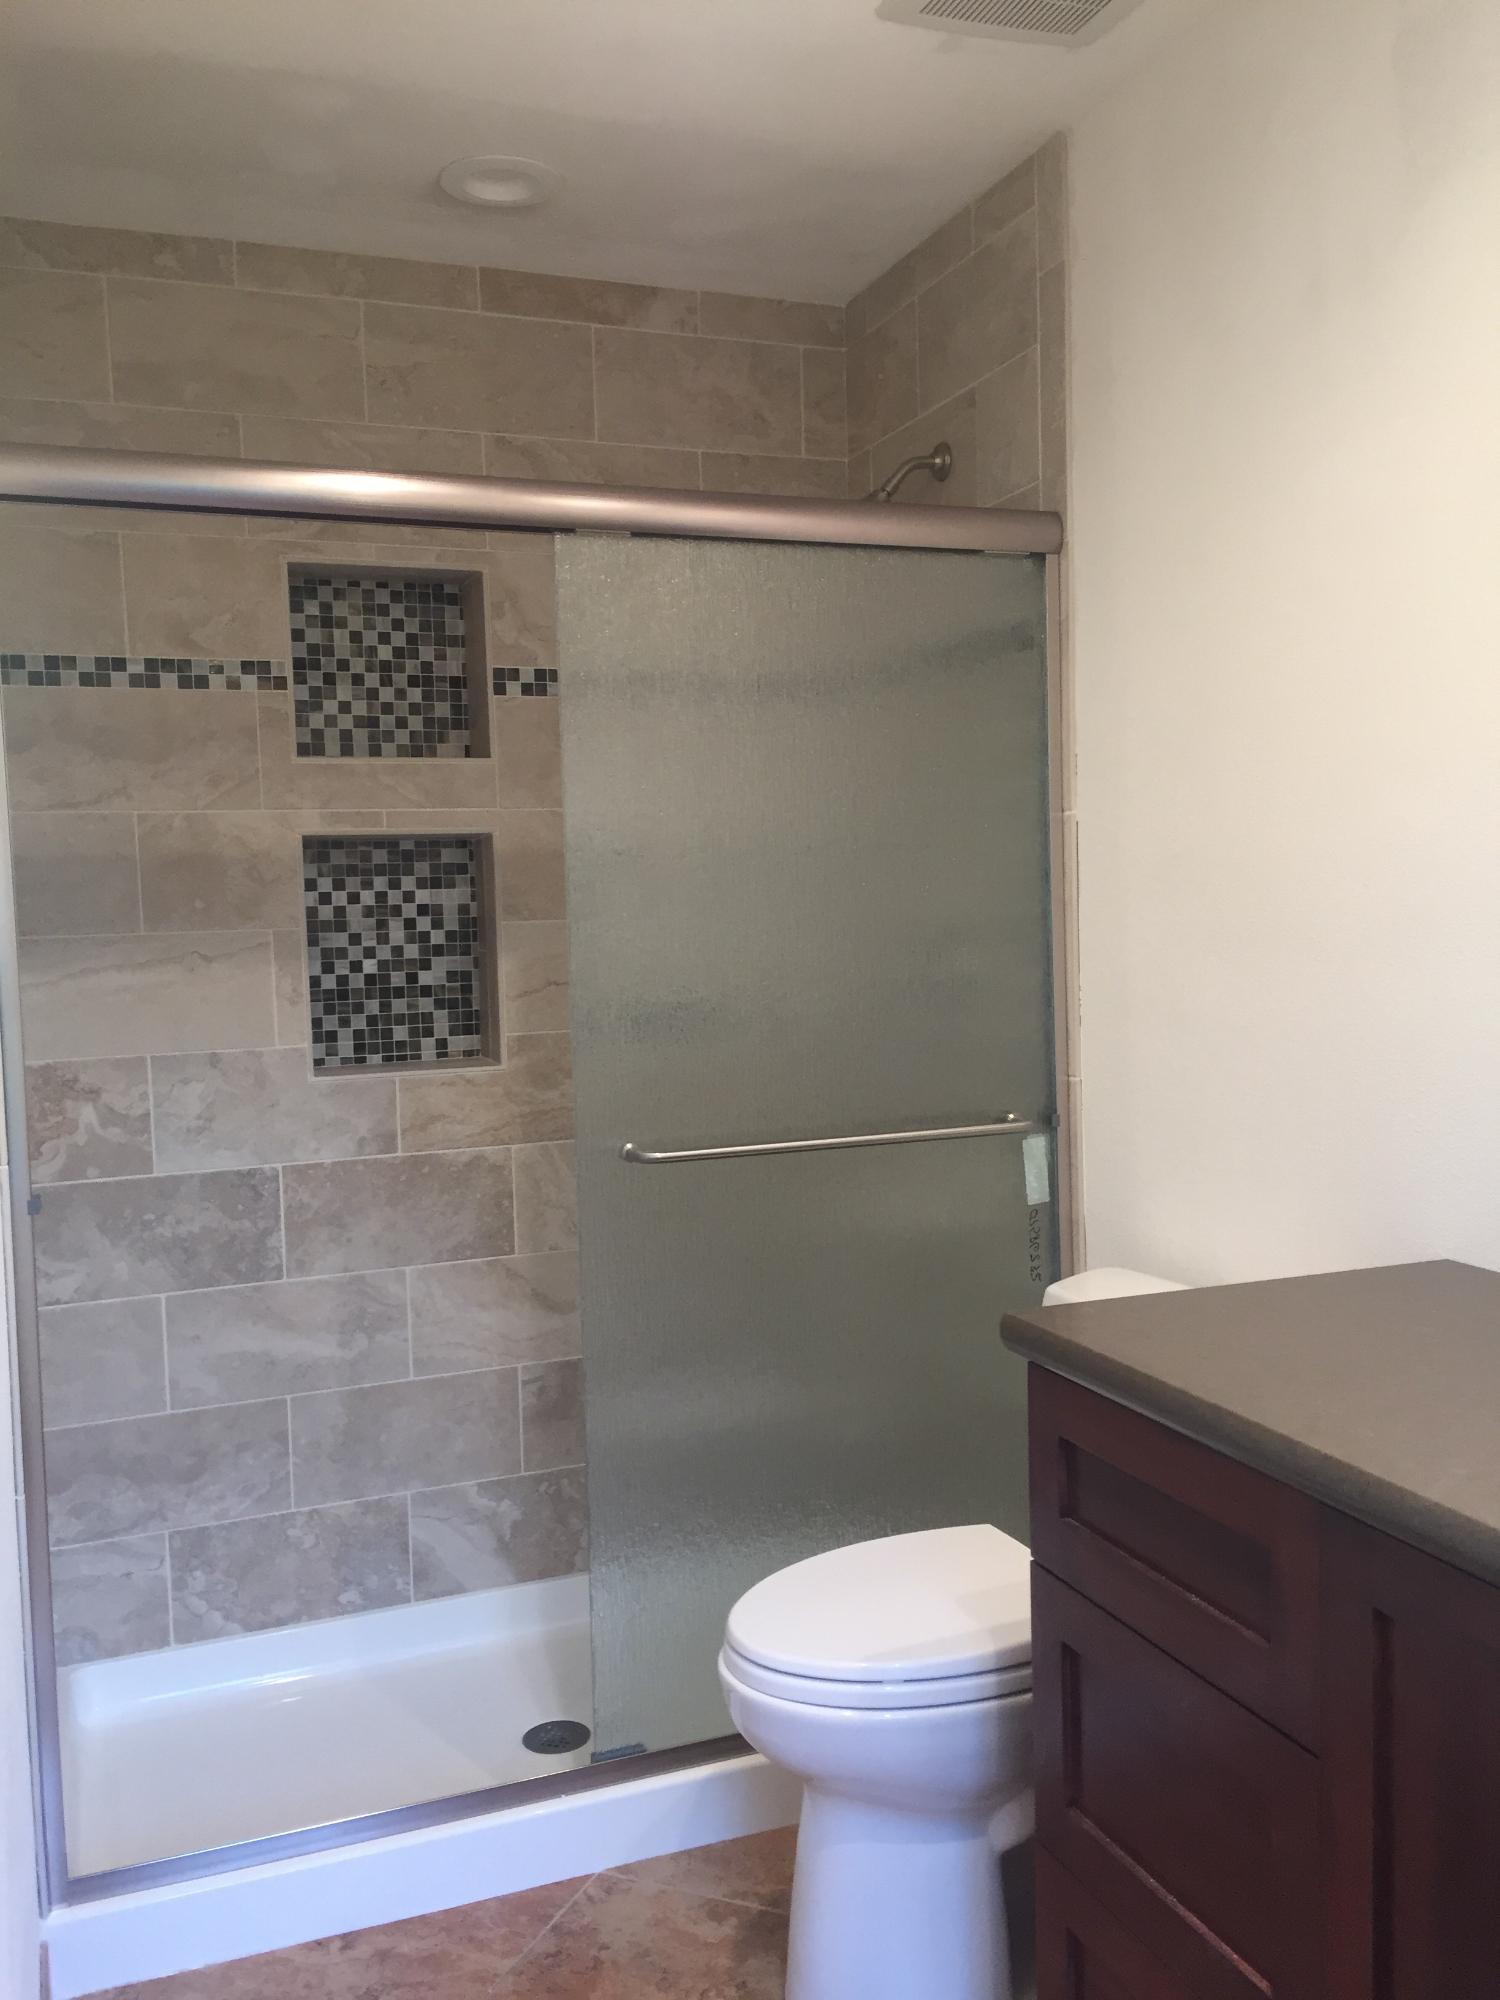 Project Gallery - Bathroom remodel walnut creek